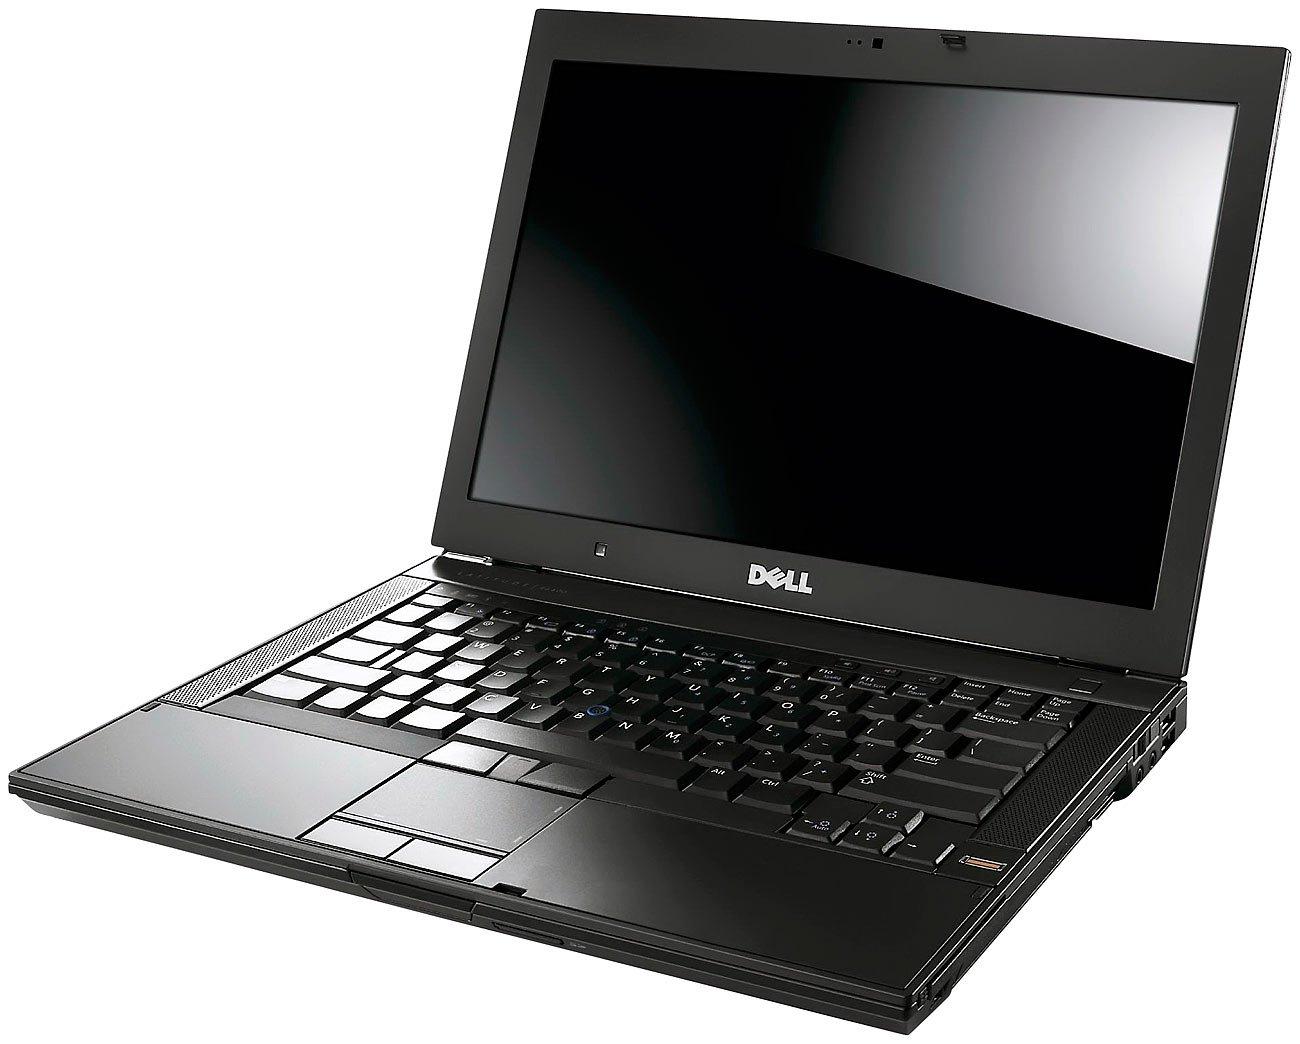 Dell &apos Latitude E6400, 14,1 WXGA +, C2d P8700, 160 GB 4 Go (Reconditionné ) 1WXGA + 160GB 4Go (Reconditionné) Dell Computers